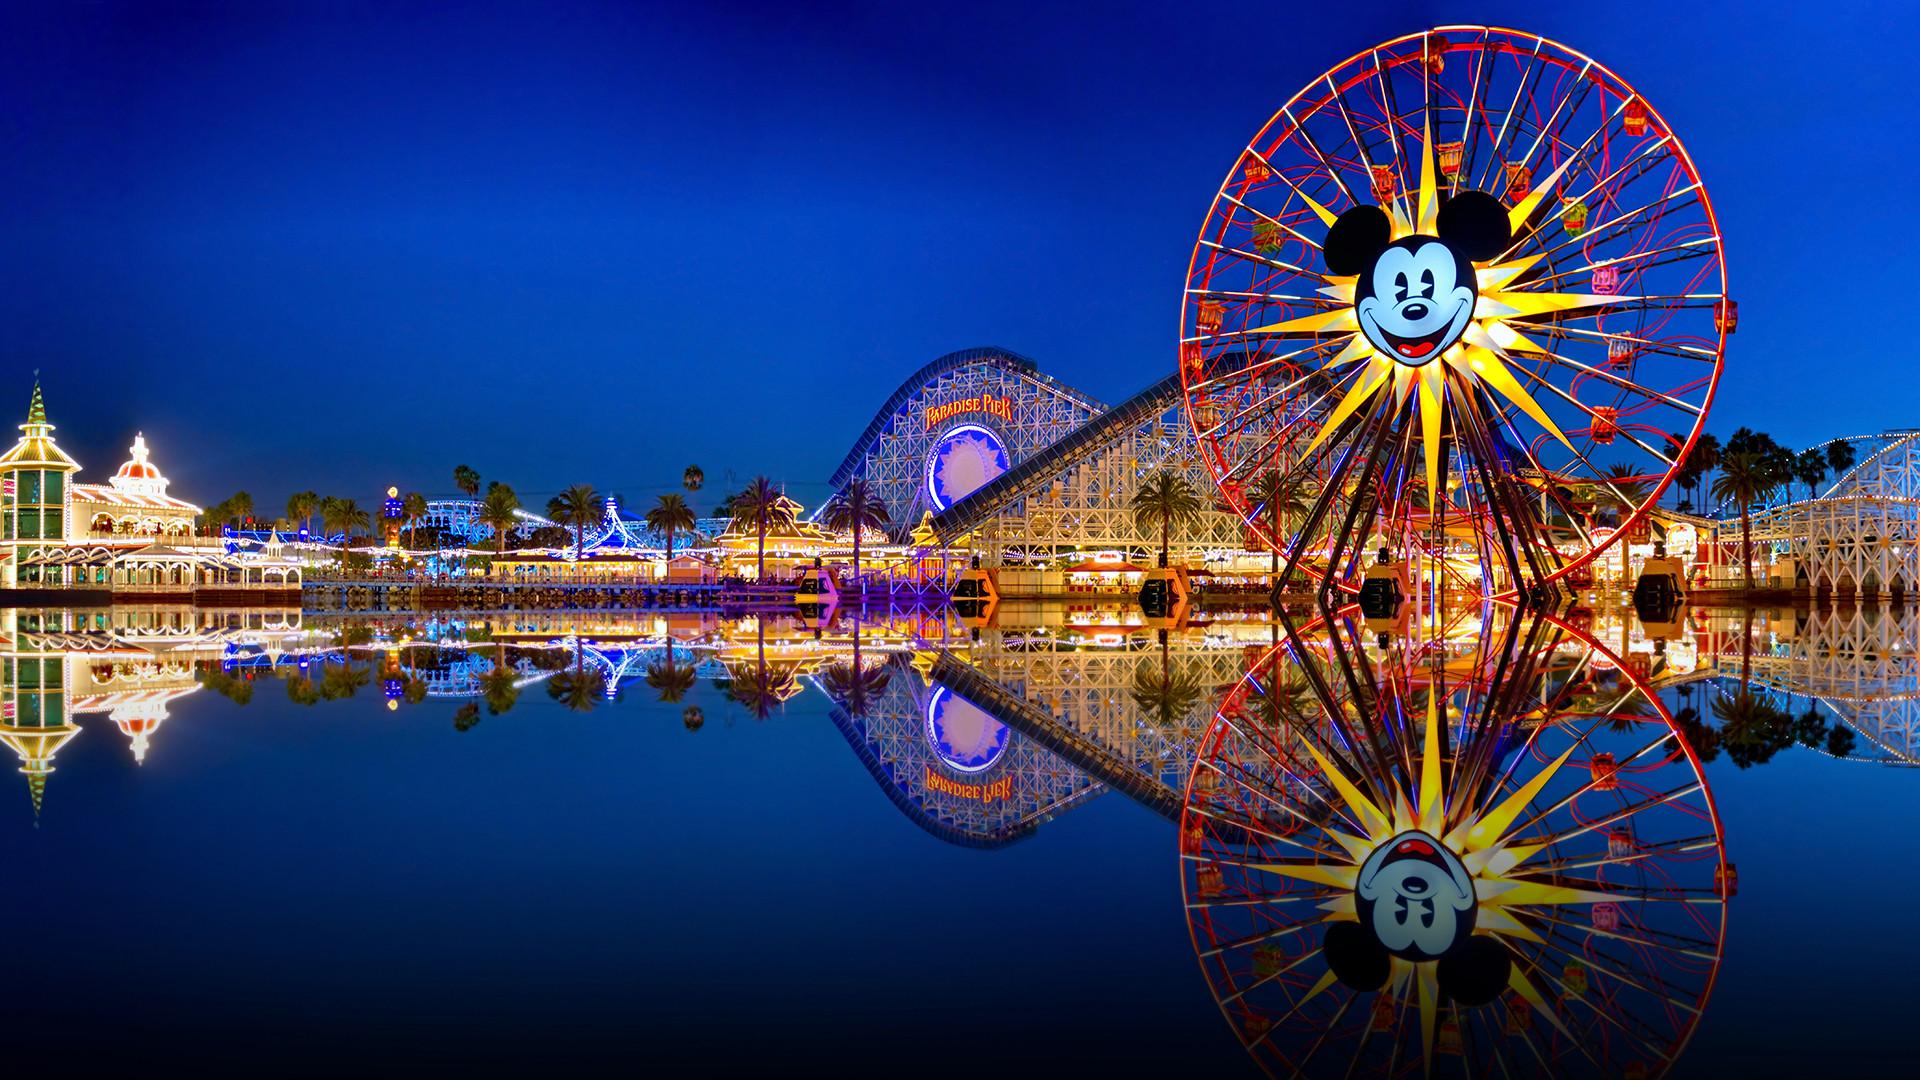 Disneyland Full HD Wallpaper.